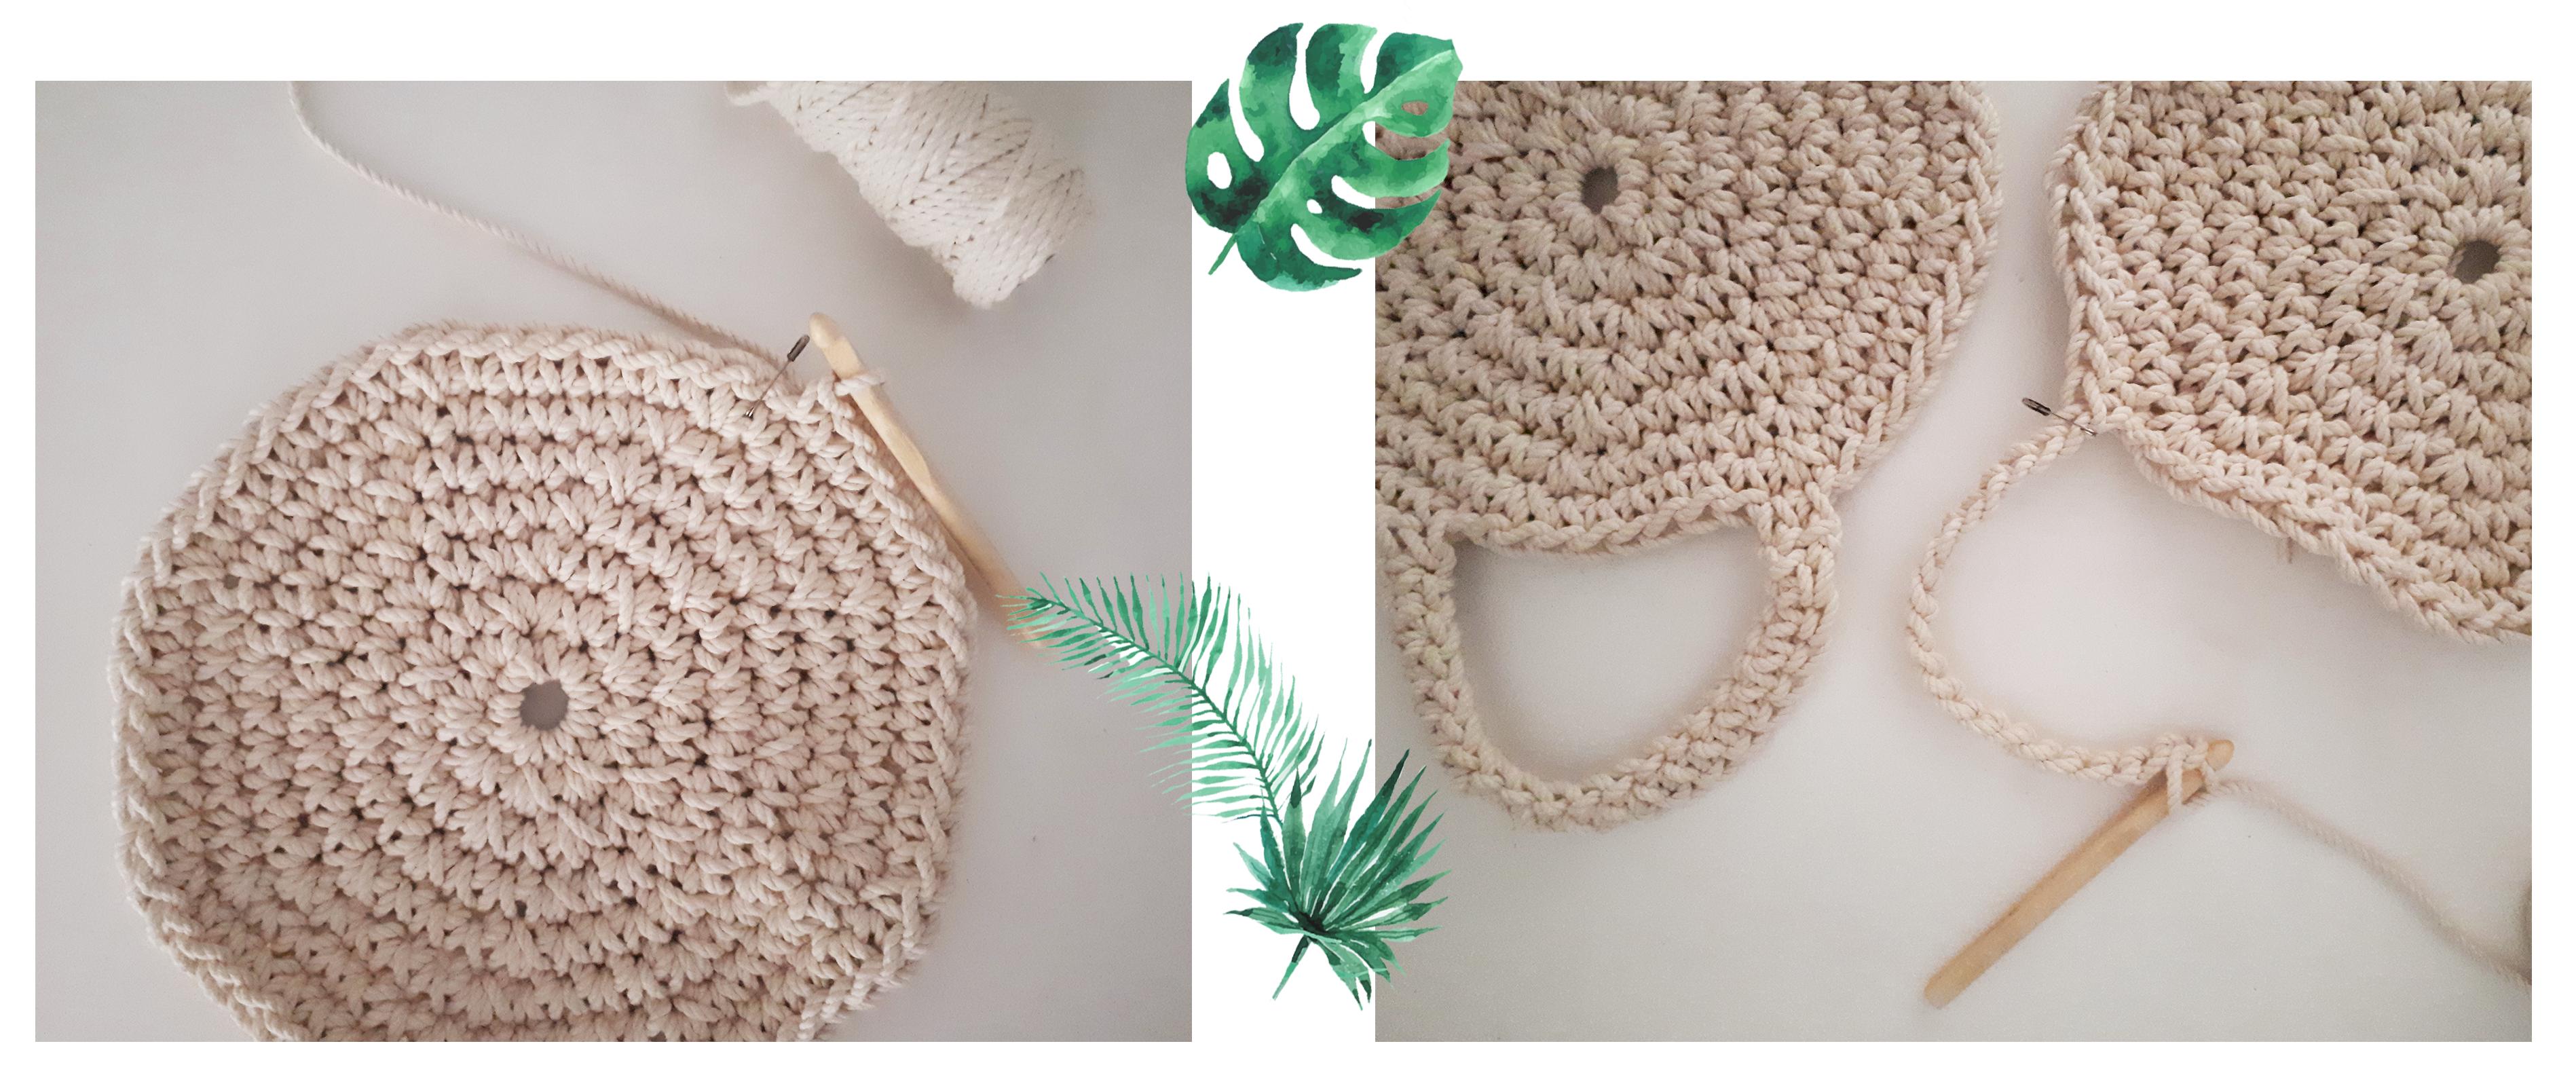 DIY-sac-rond-crochet-etape-5-6-Cactus-and-Style